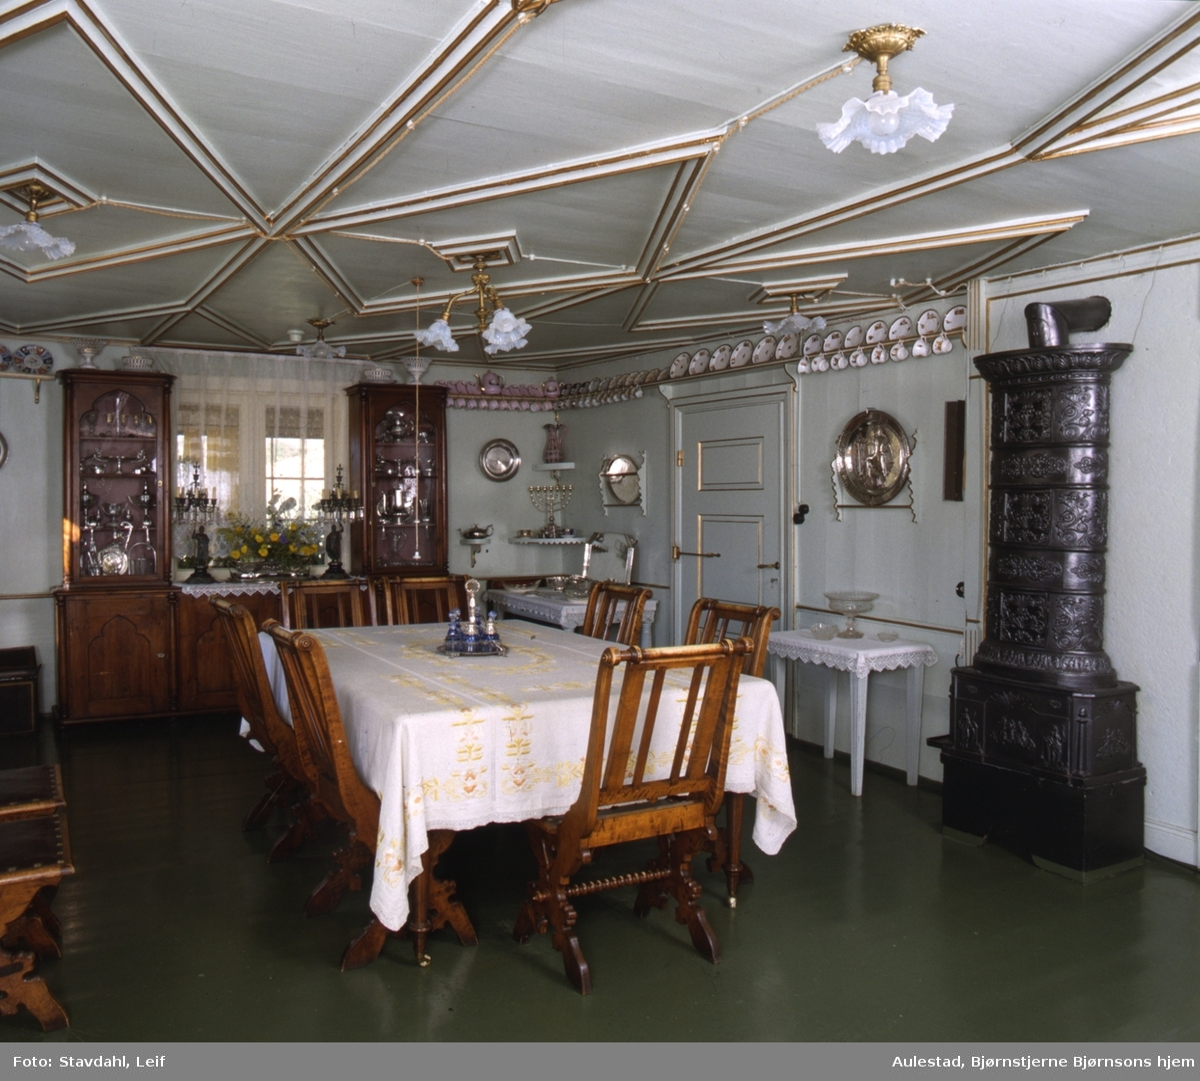 DOK:1991, Aulestad, interiør, spisestue, bord, stol, ovn,